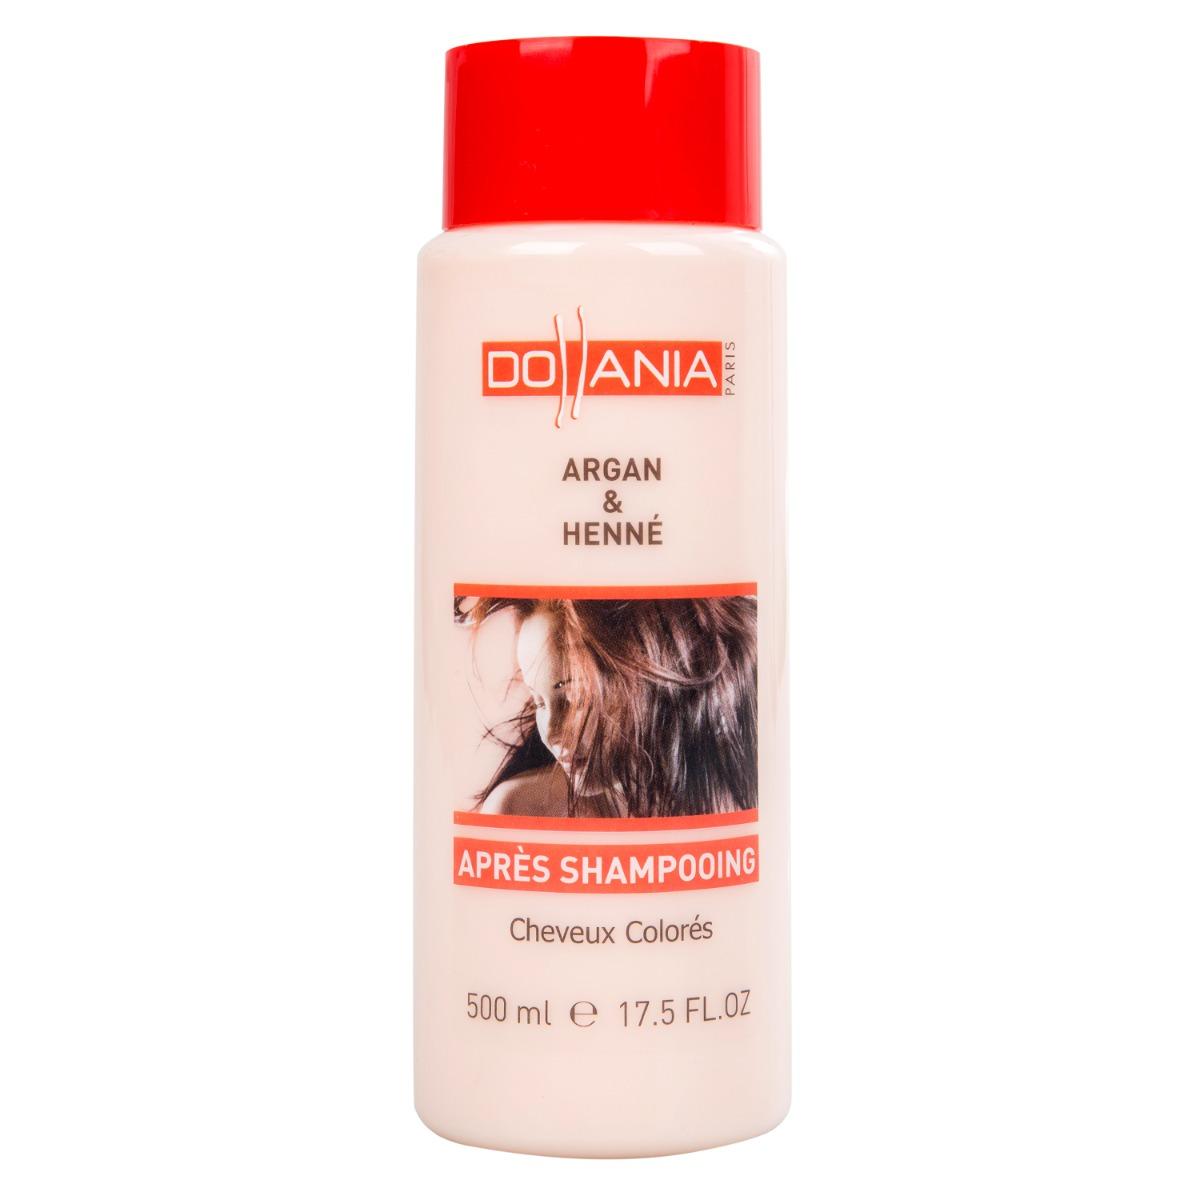 Dầu Xả DOLLANIA Conditioner 500ml dưỡng tóc